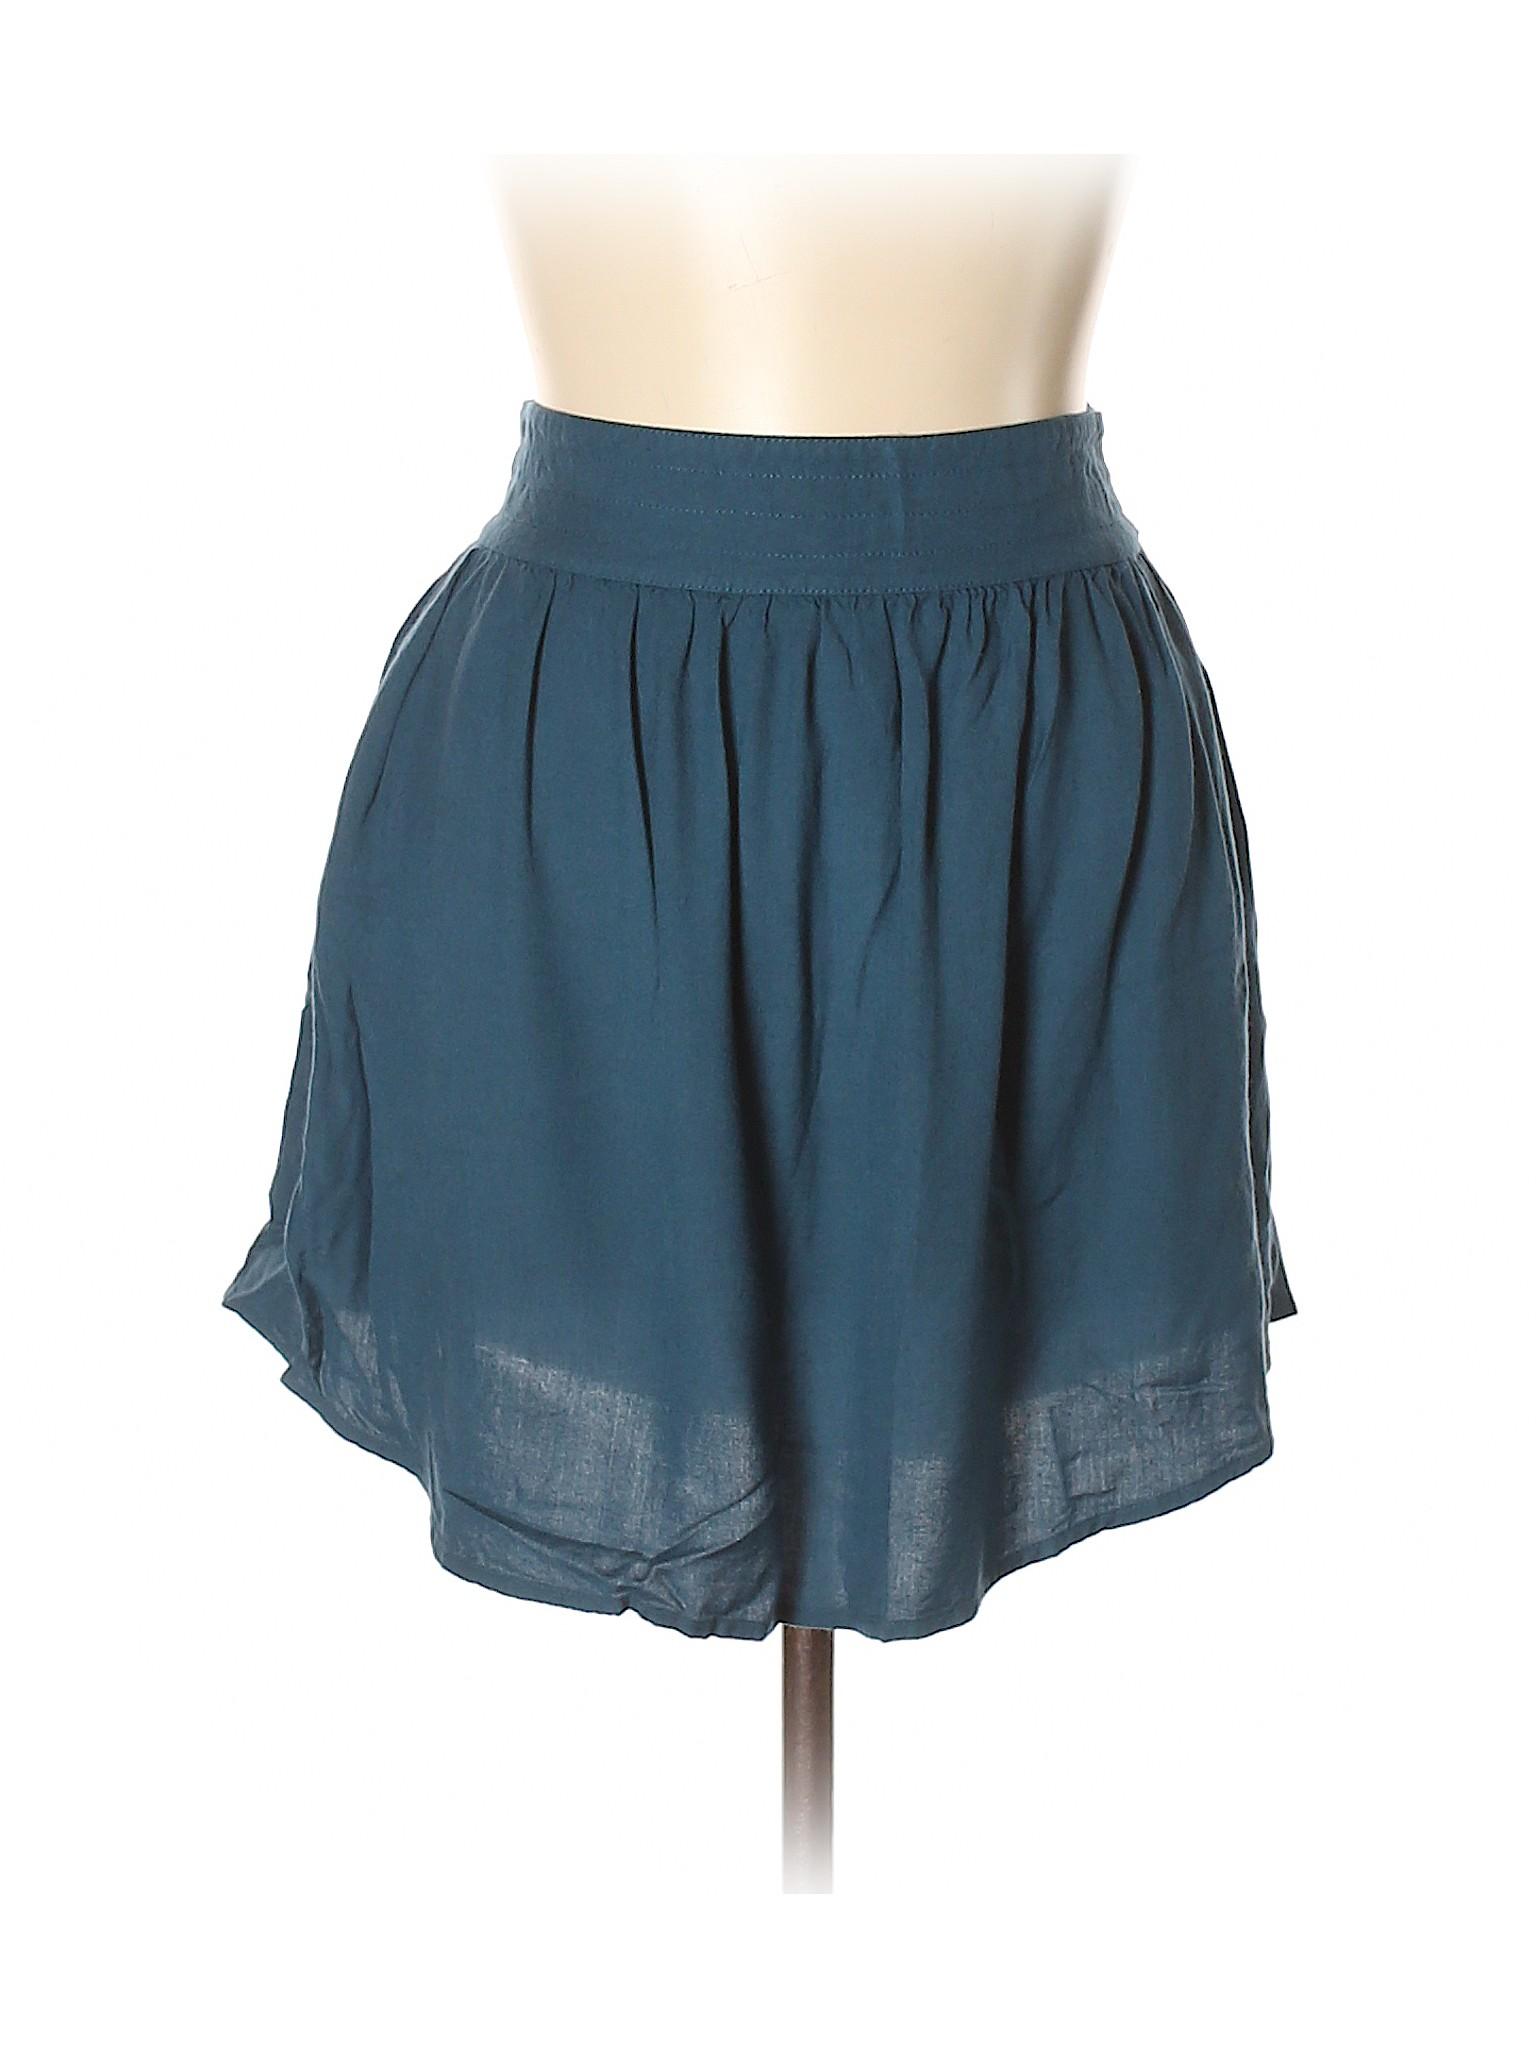 Skirt Casual Skirt Boutique Skirt Boutique Casual Boutique Boutique Skirt Casual Casual dXFPIqd